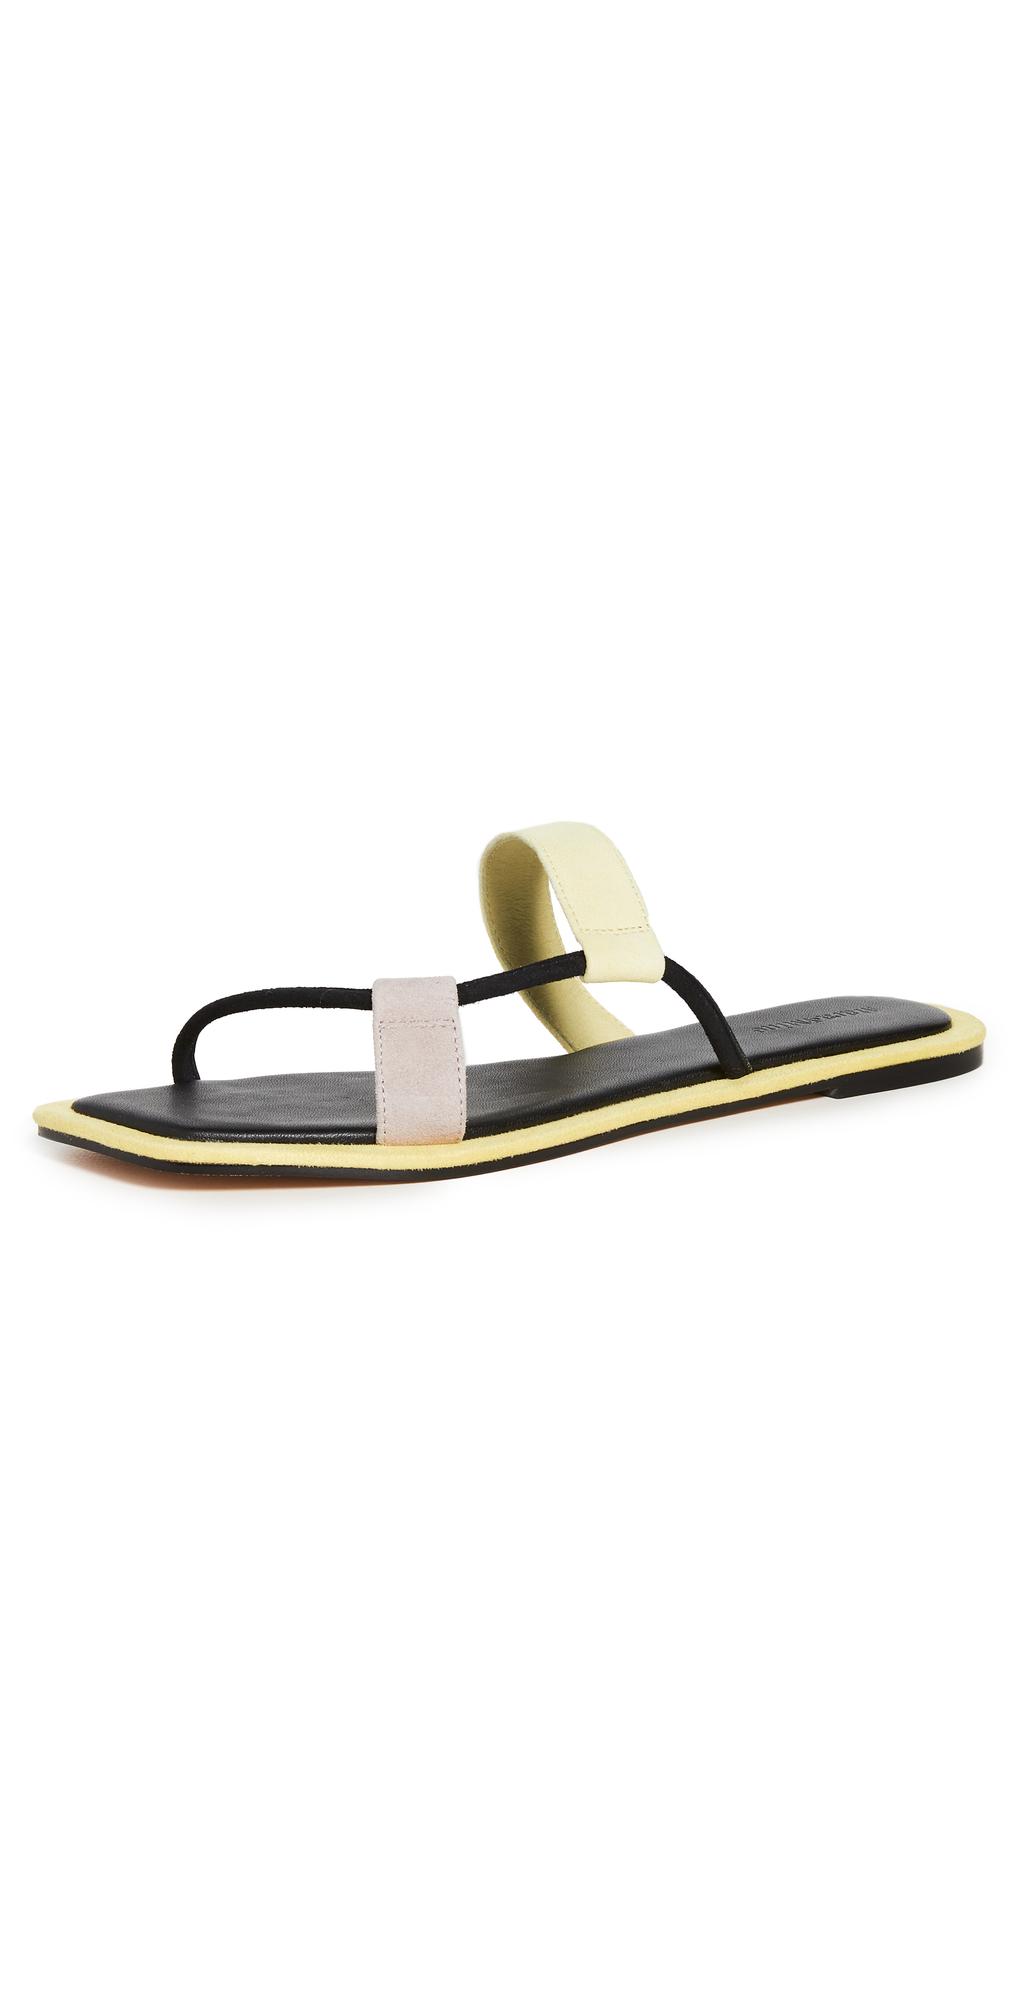 Delfine Sandals